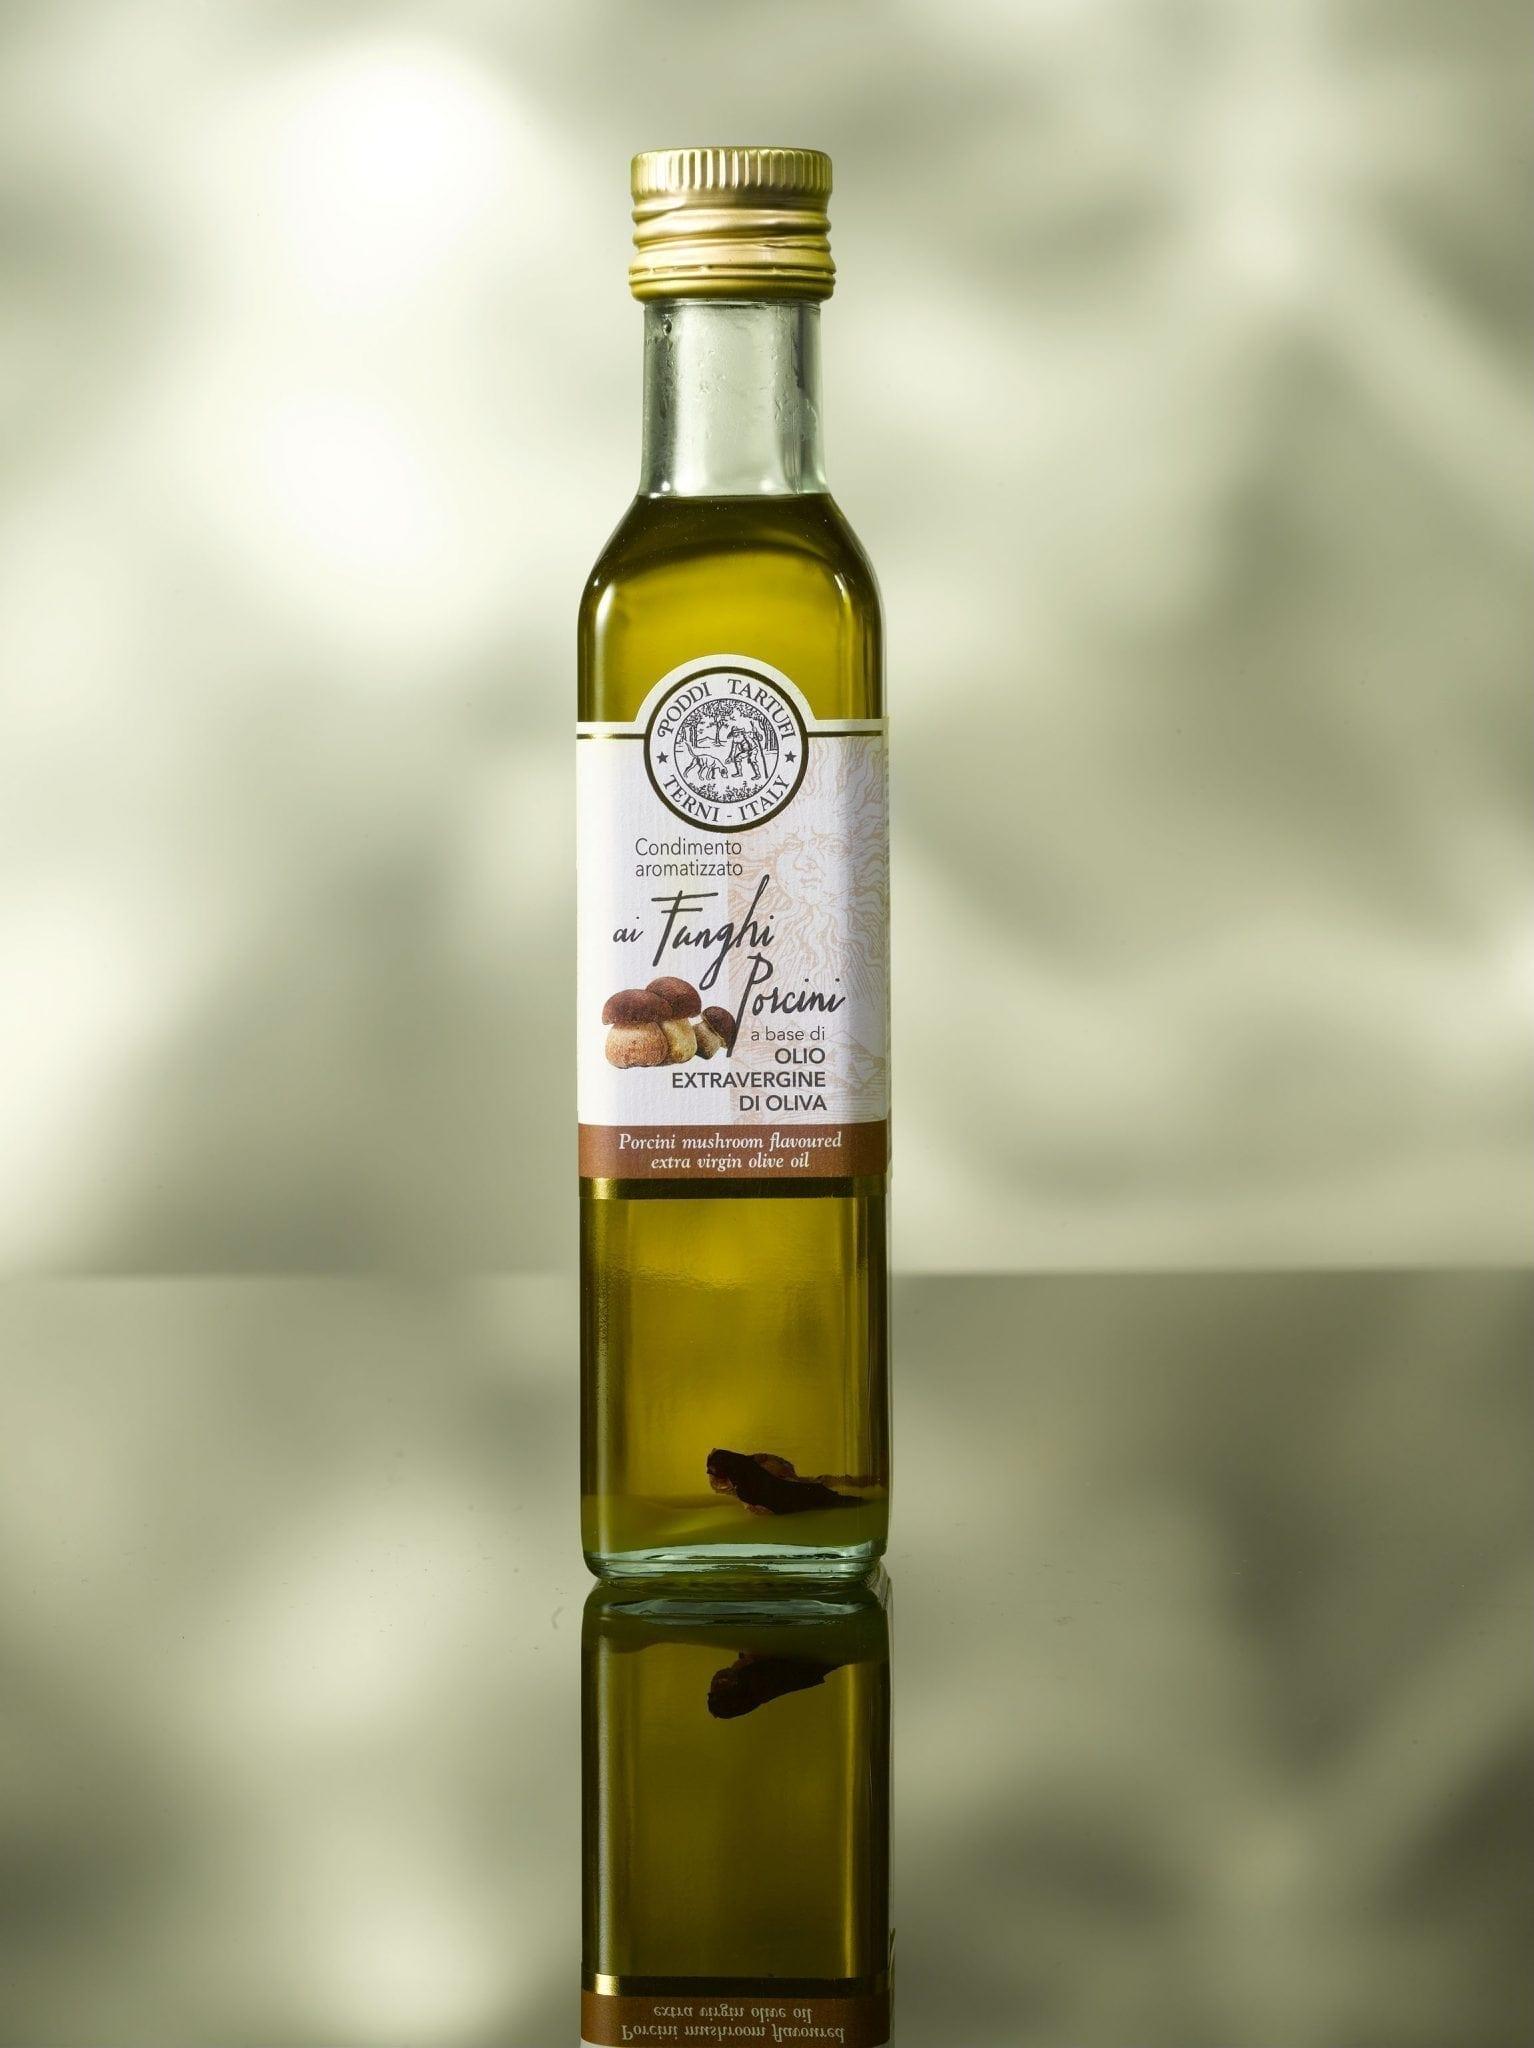 Porcini olijfolie, Poddi tartufi 250ml